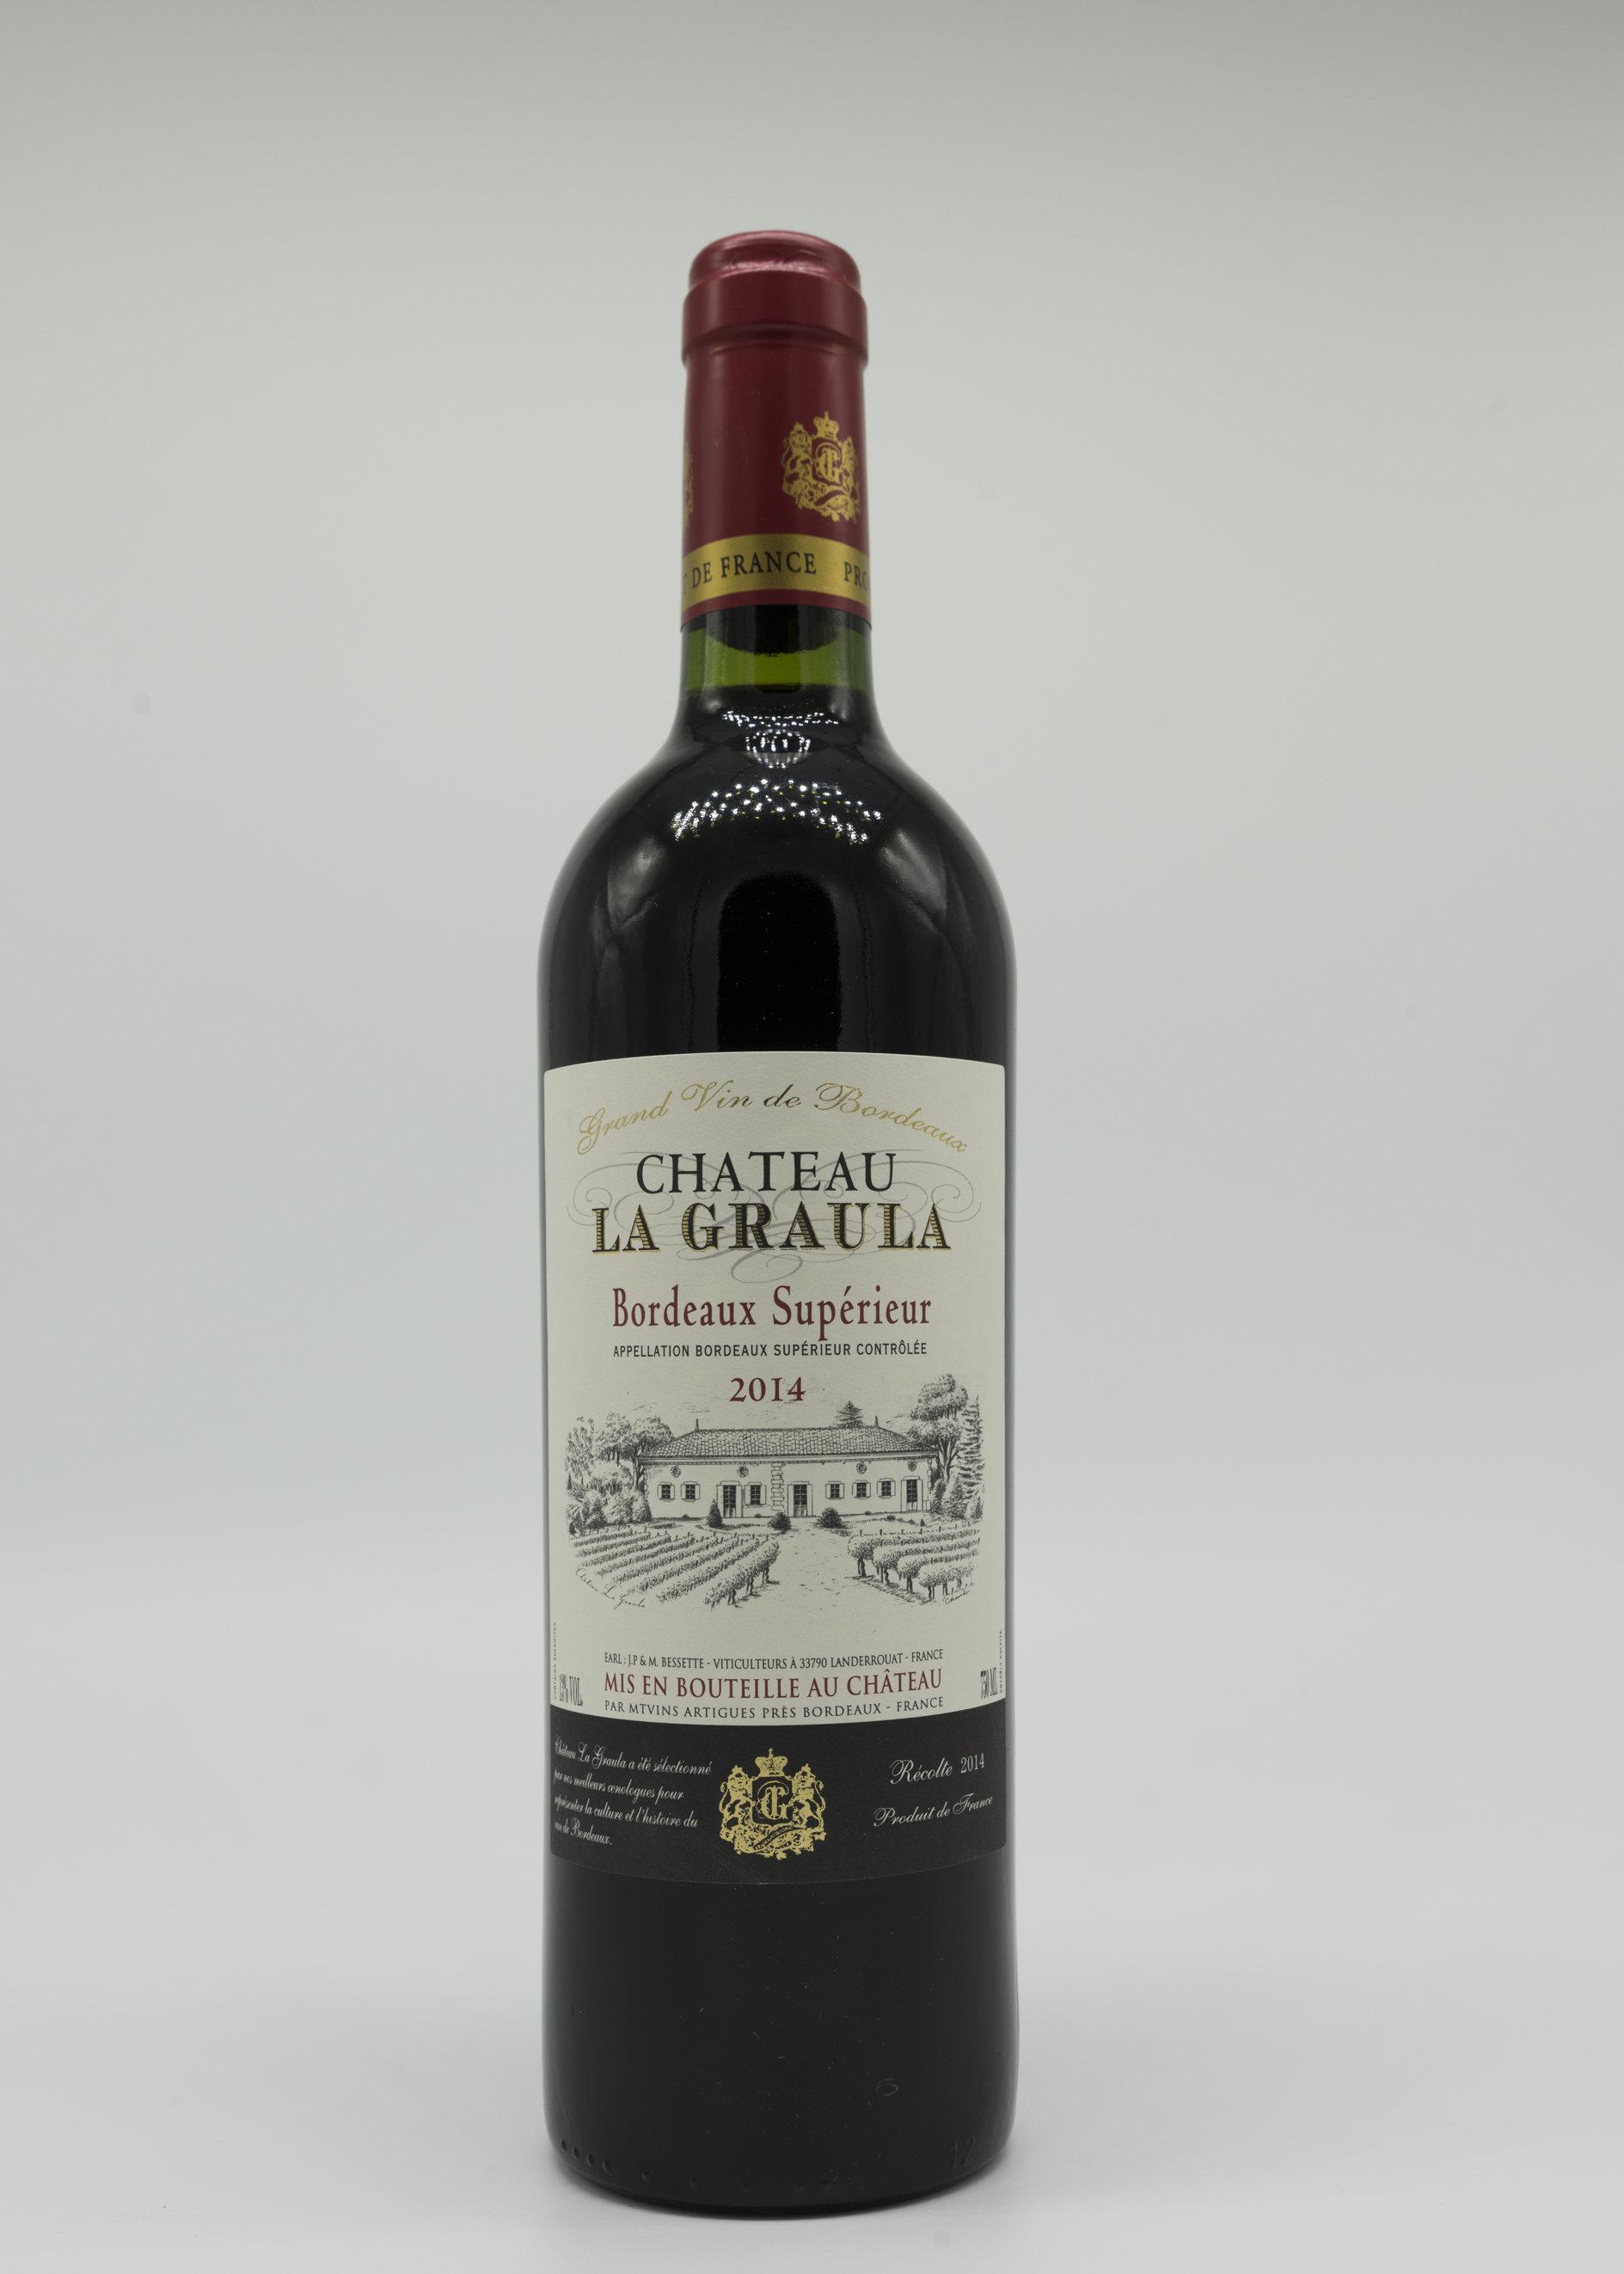 Chateau La Graula Bordeaux Superior, 2015 FR17